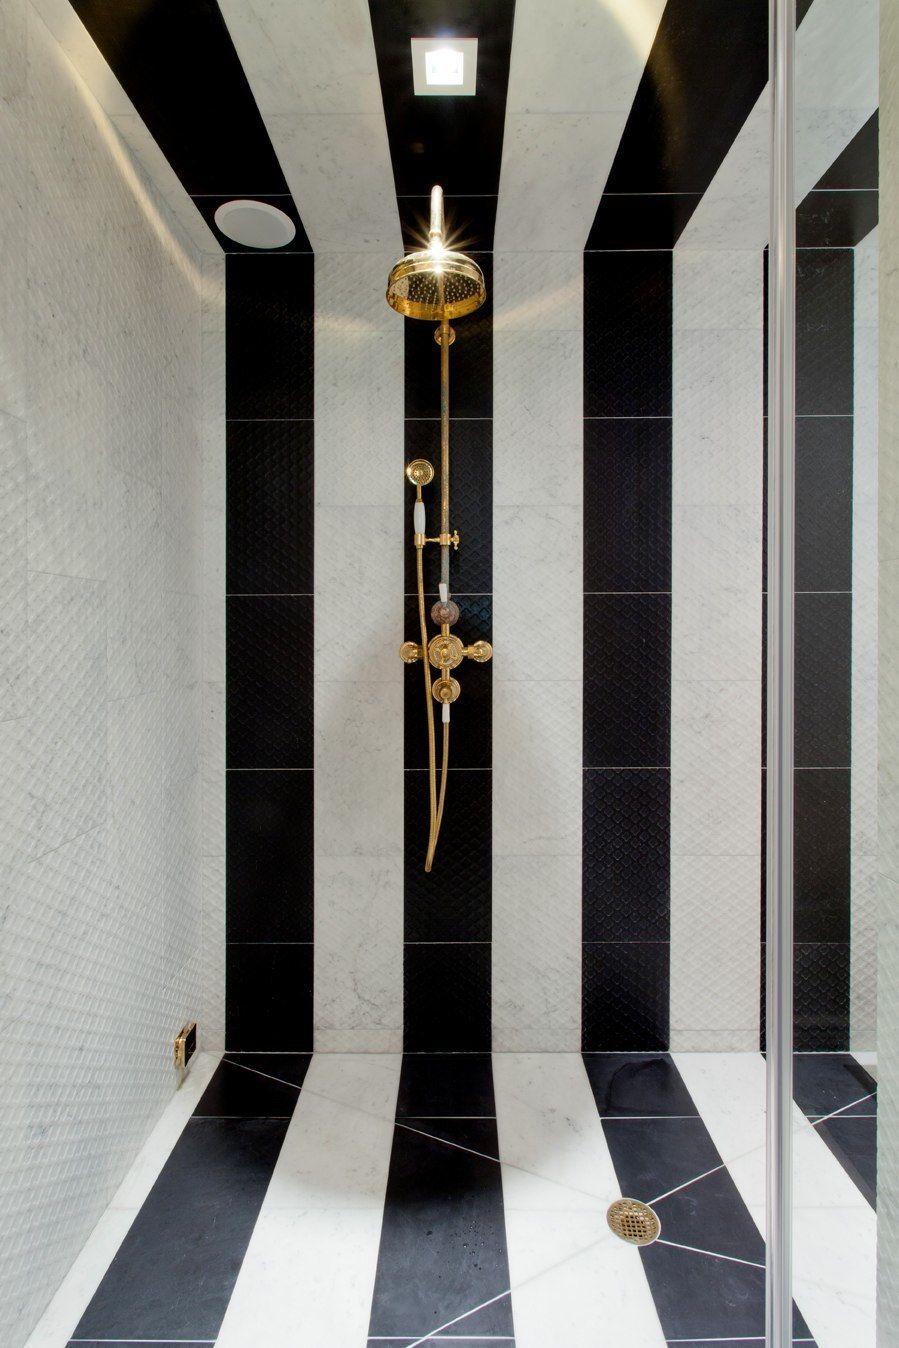 Home Bathroom Tile Designs Black And White Tiles Amazing Bathrooms